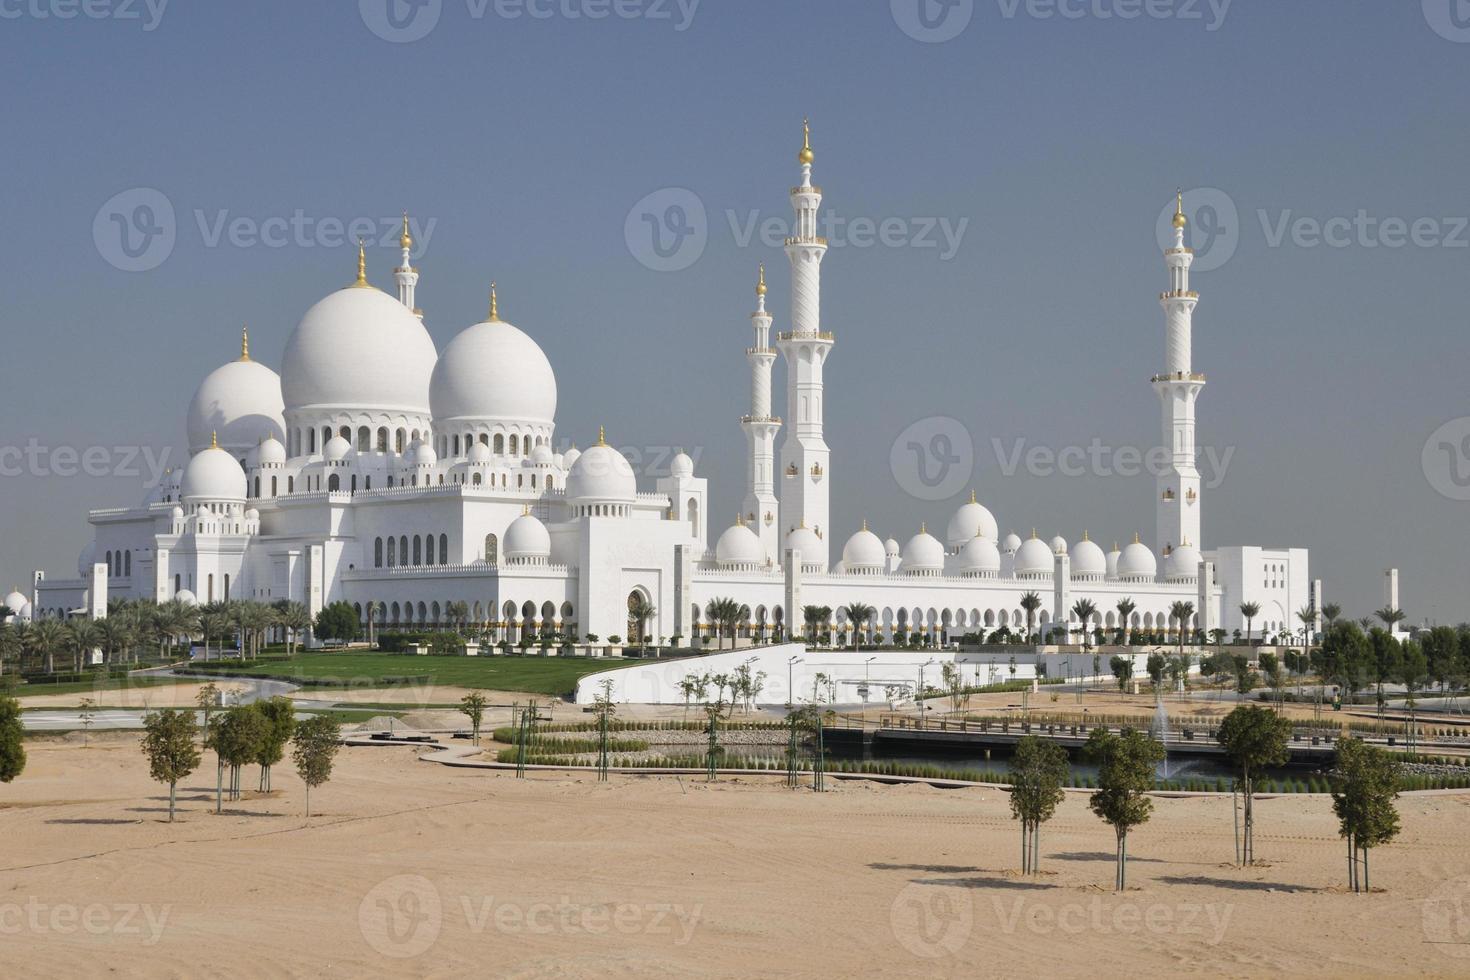 White Sheikh Zayed Mosque in Abu Dhabi photo